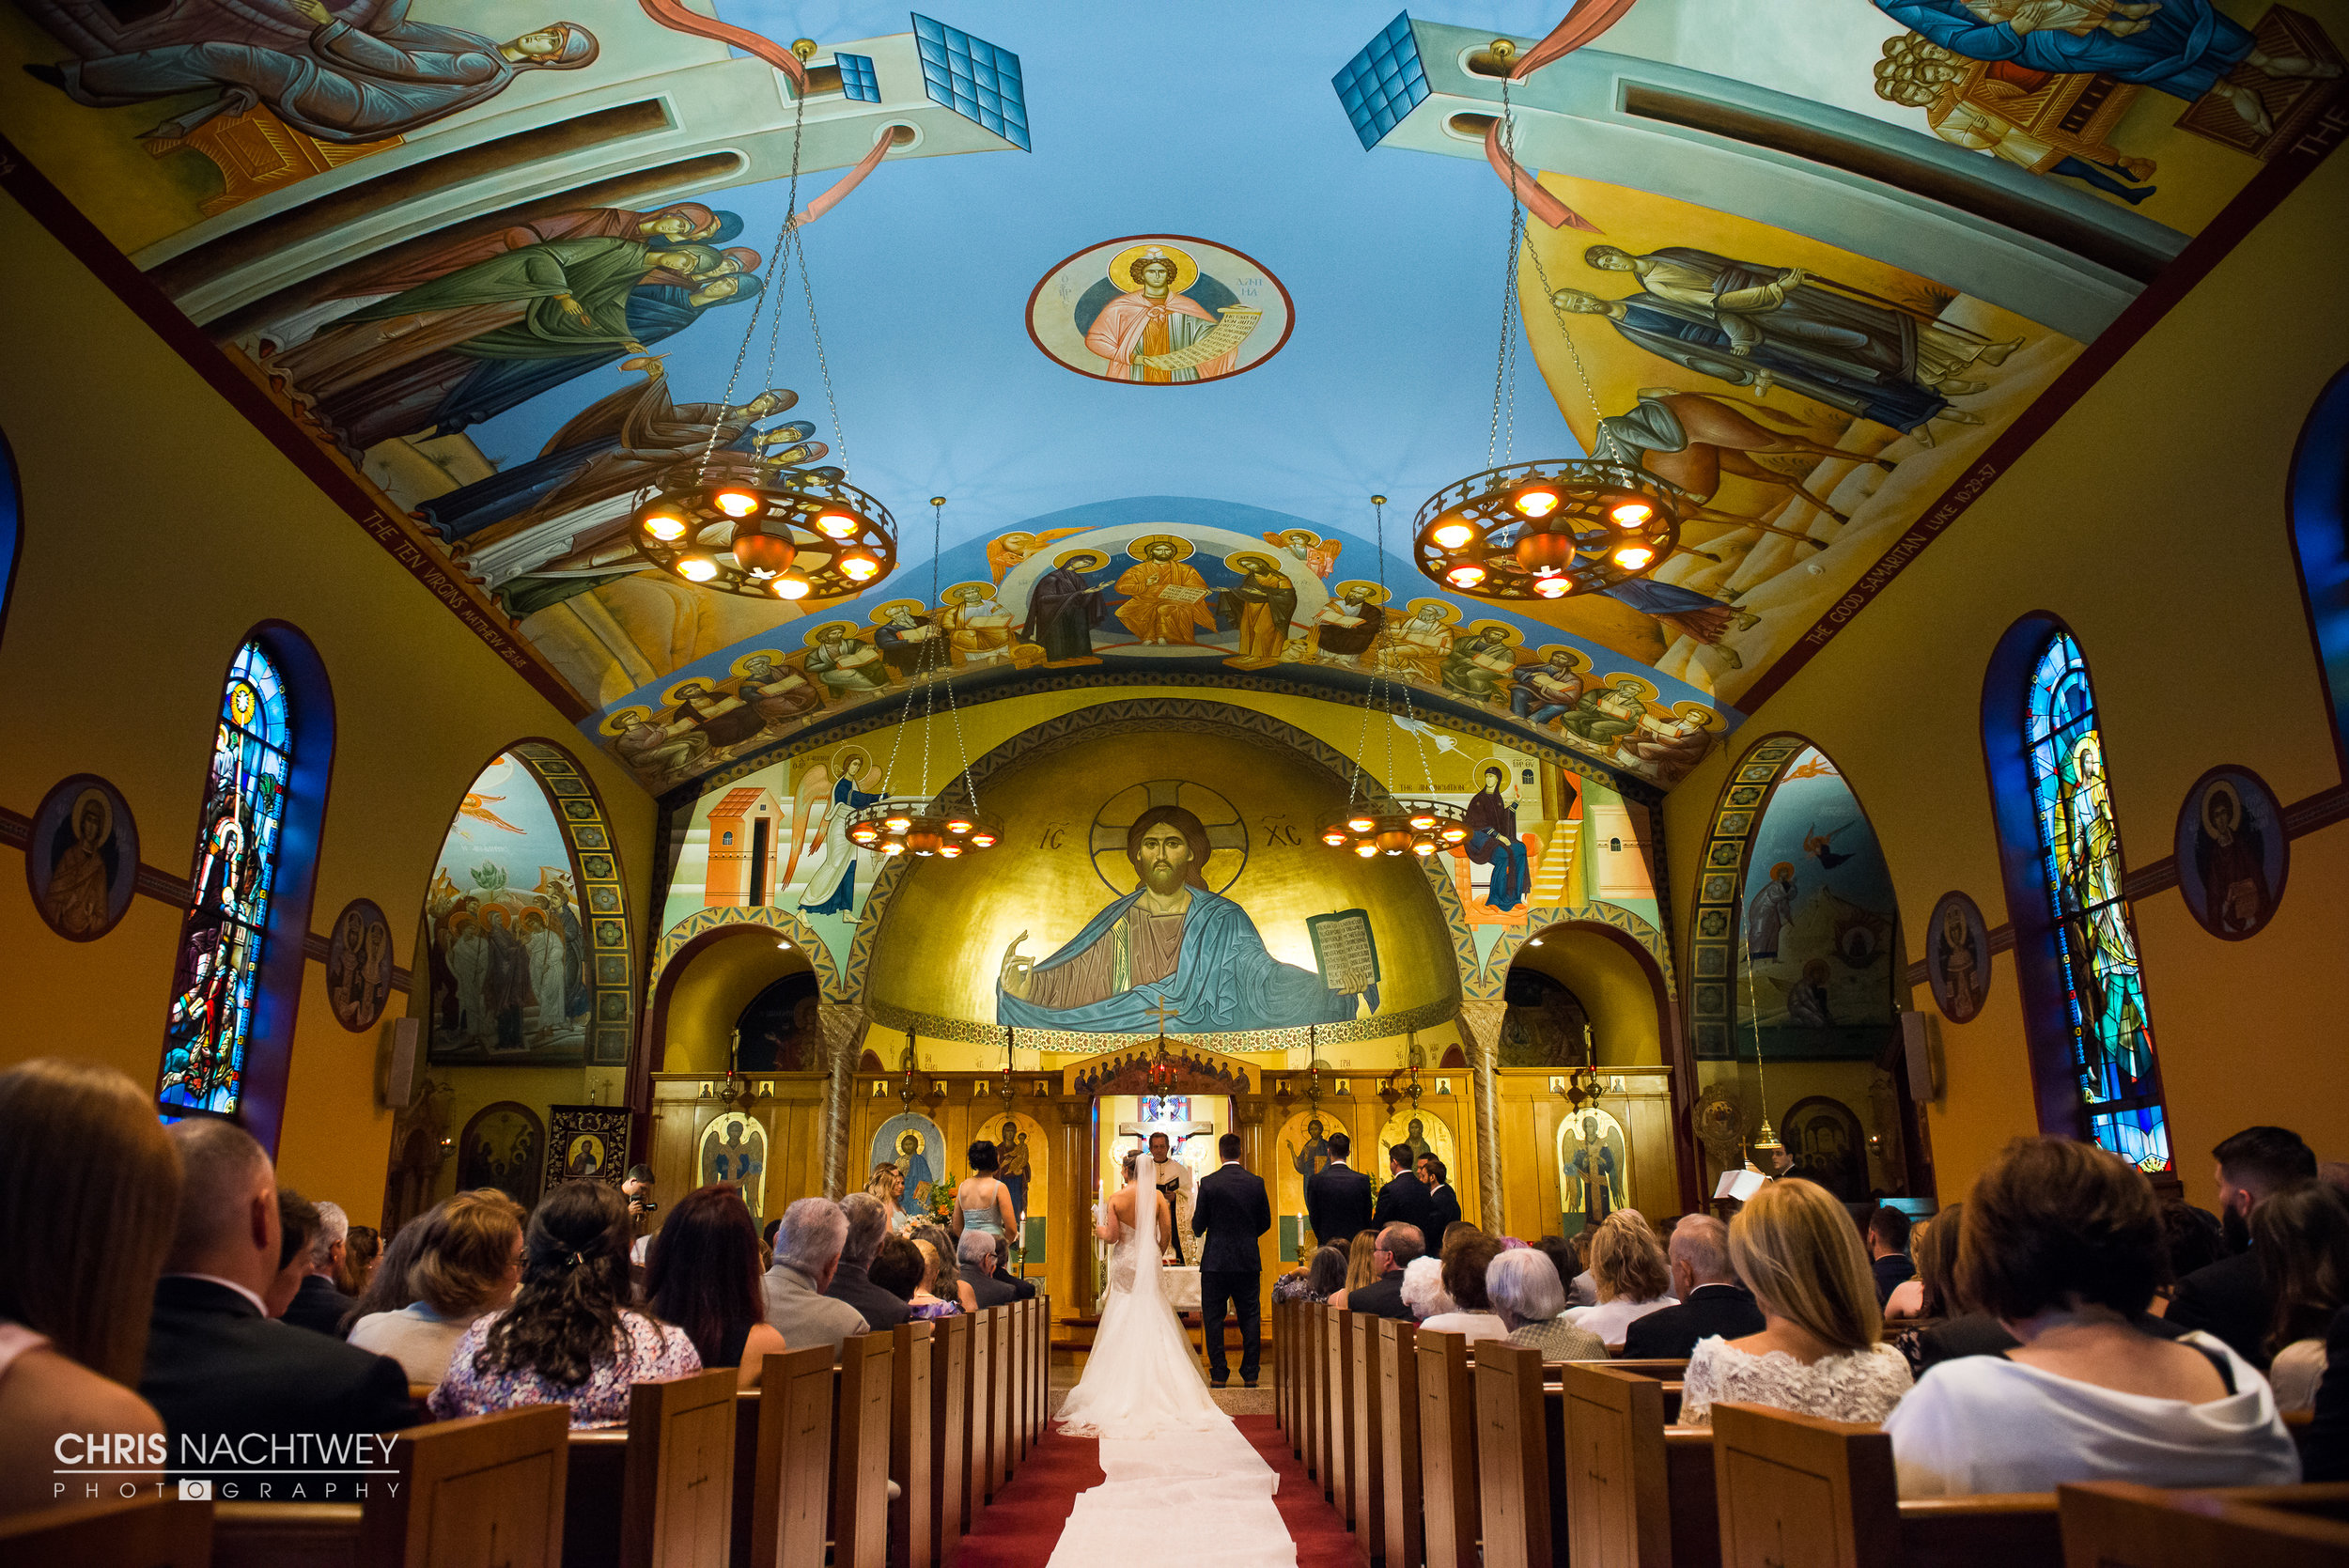 mystic-artistic-wedding-photographer-chris-nachtwey-2017-11.jpg